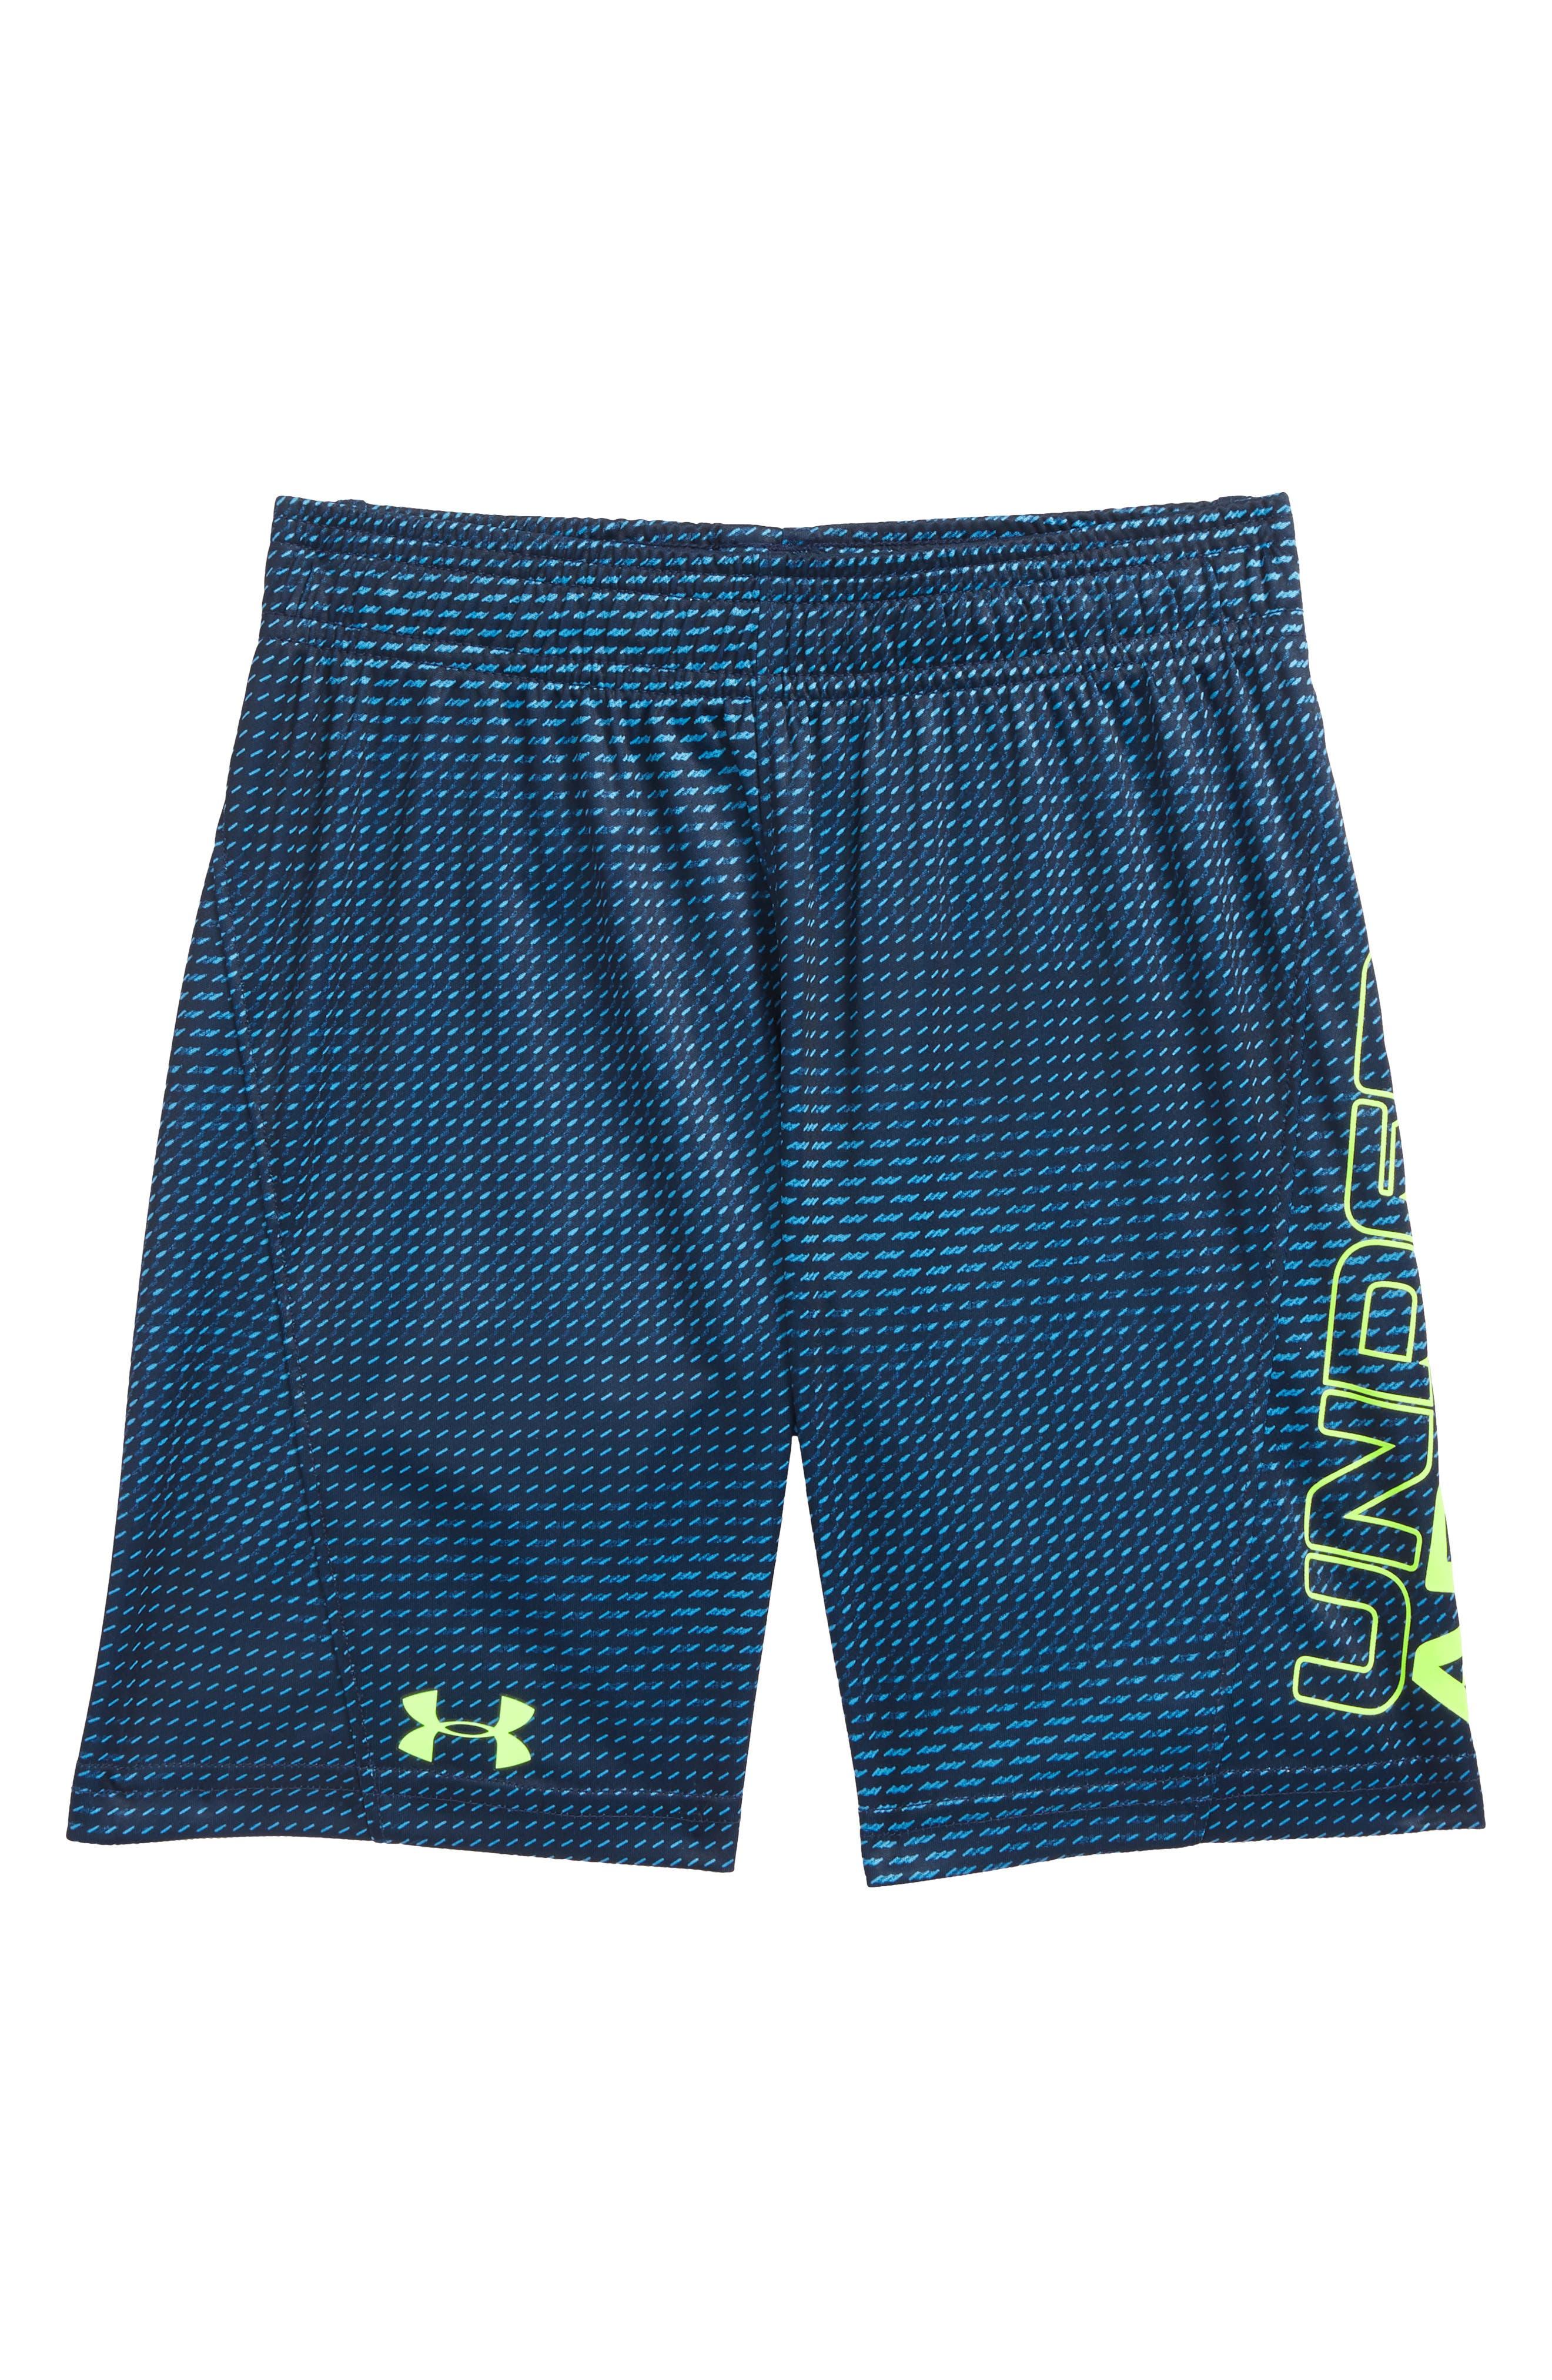 Sync Boost HeatGear<sup>®</sup> Shorts,                             Main thumbnail 1, color,                             Canoe Blue